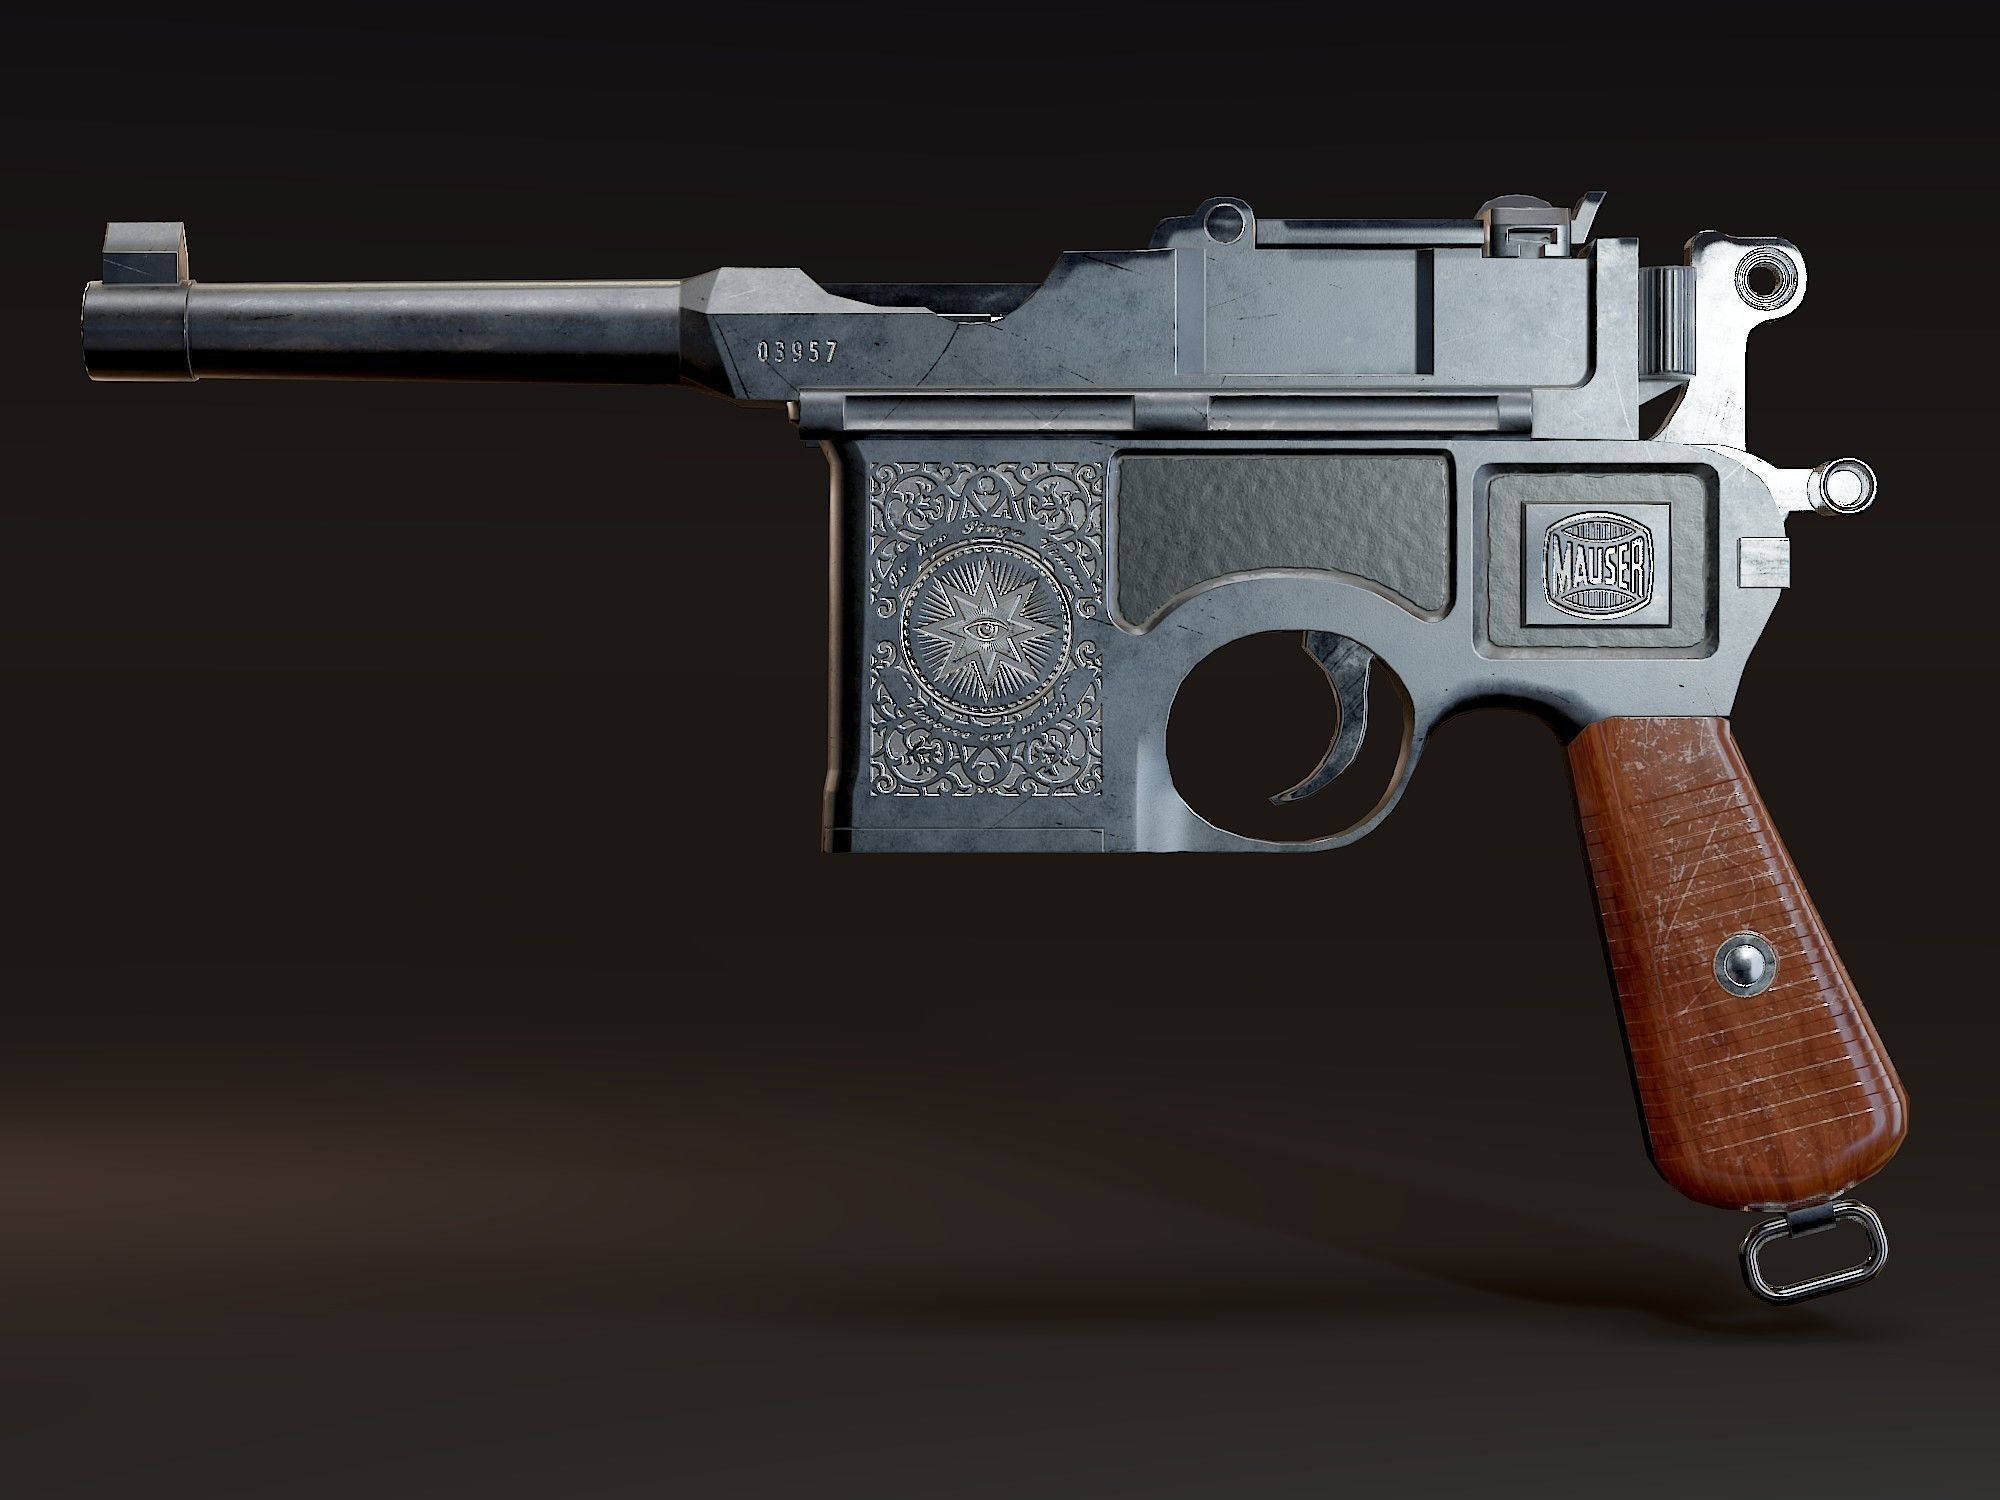 Mauser C96 dating ulkona puukattila koukku ylös